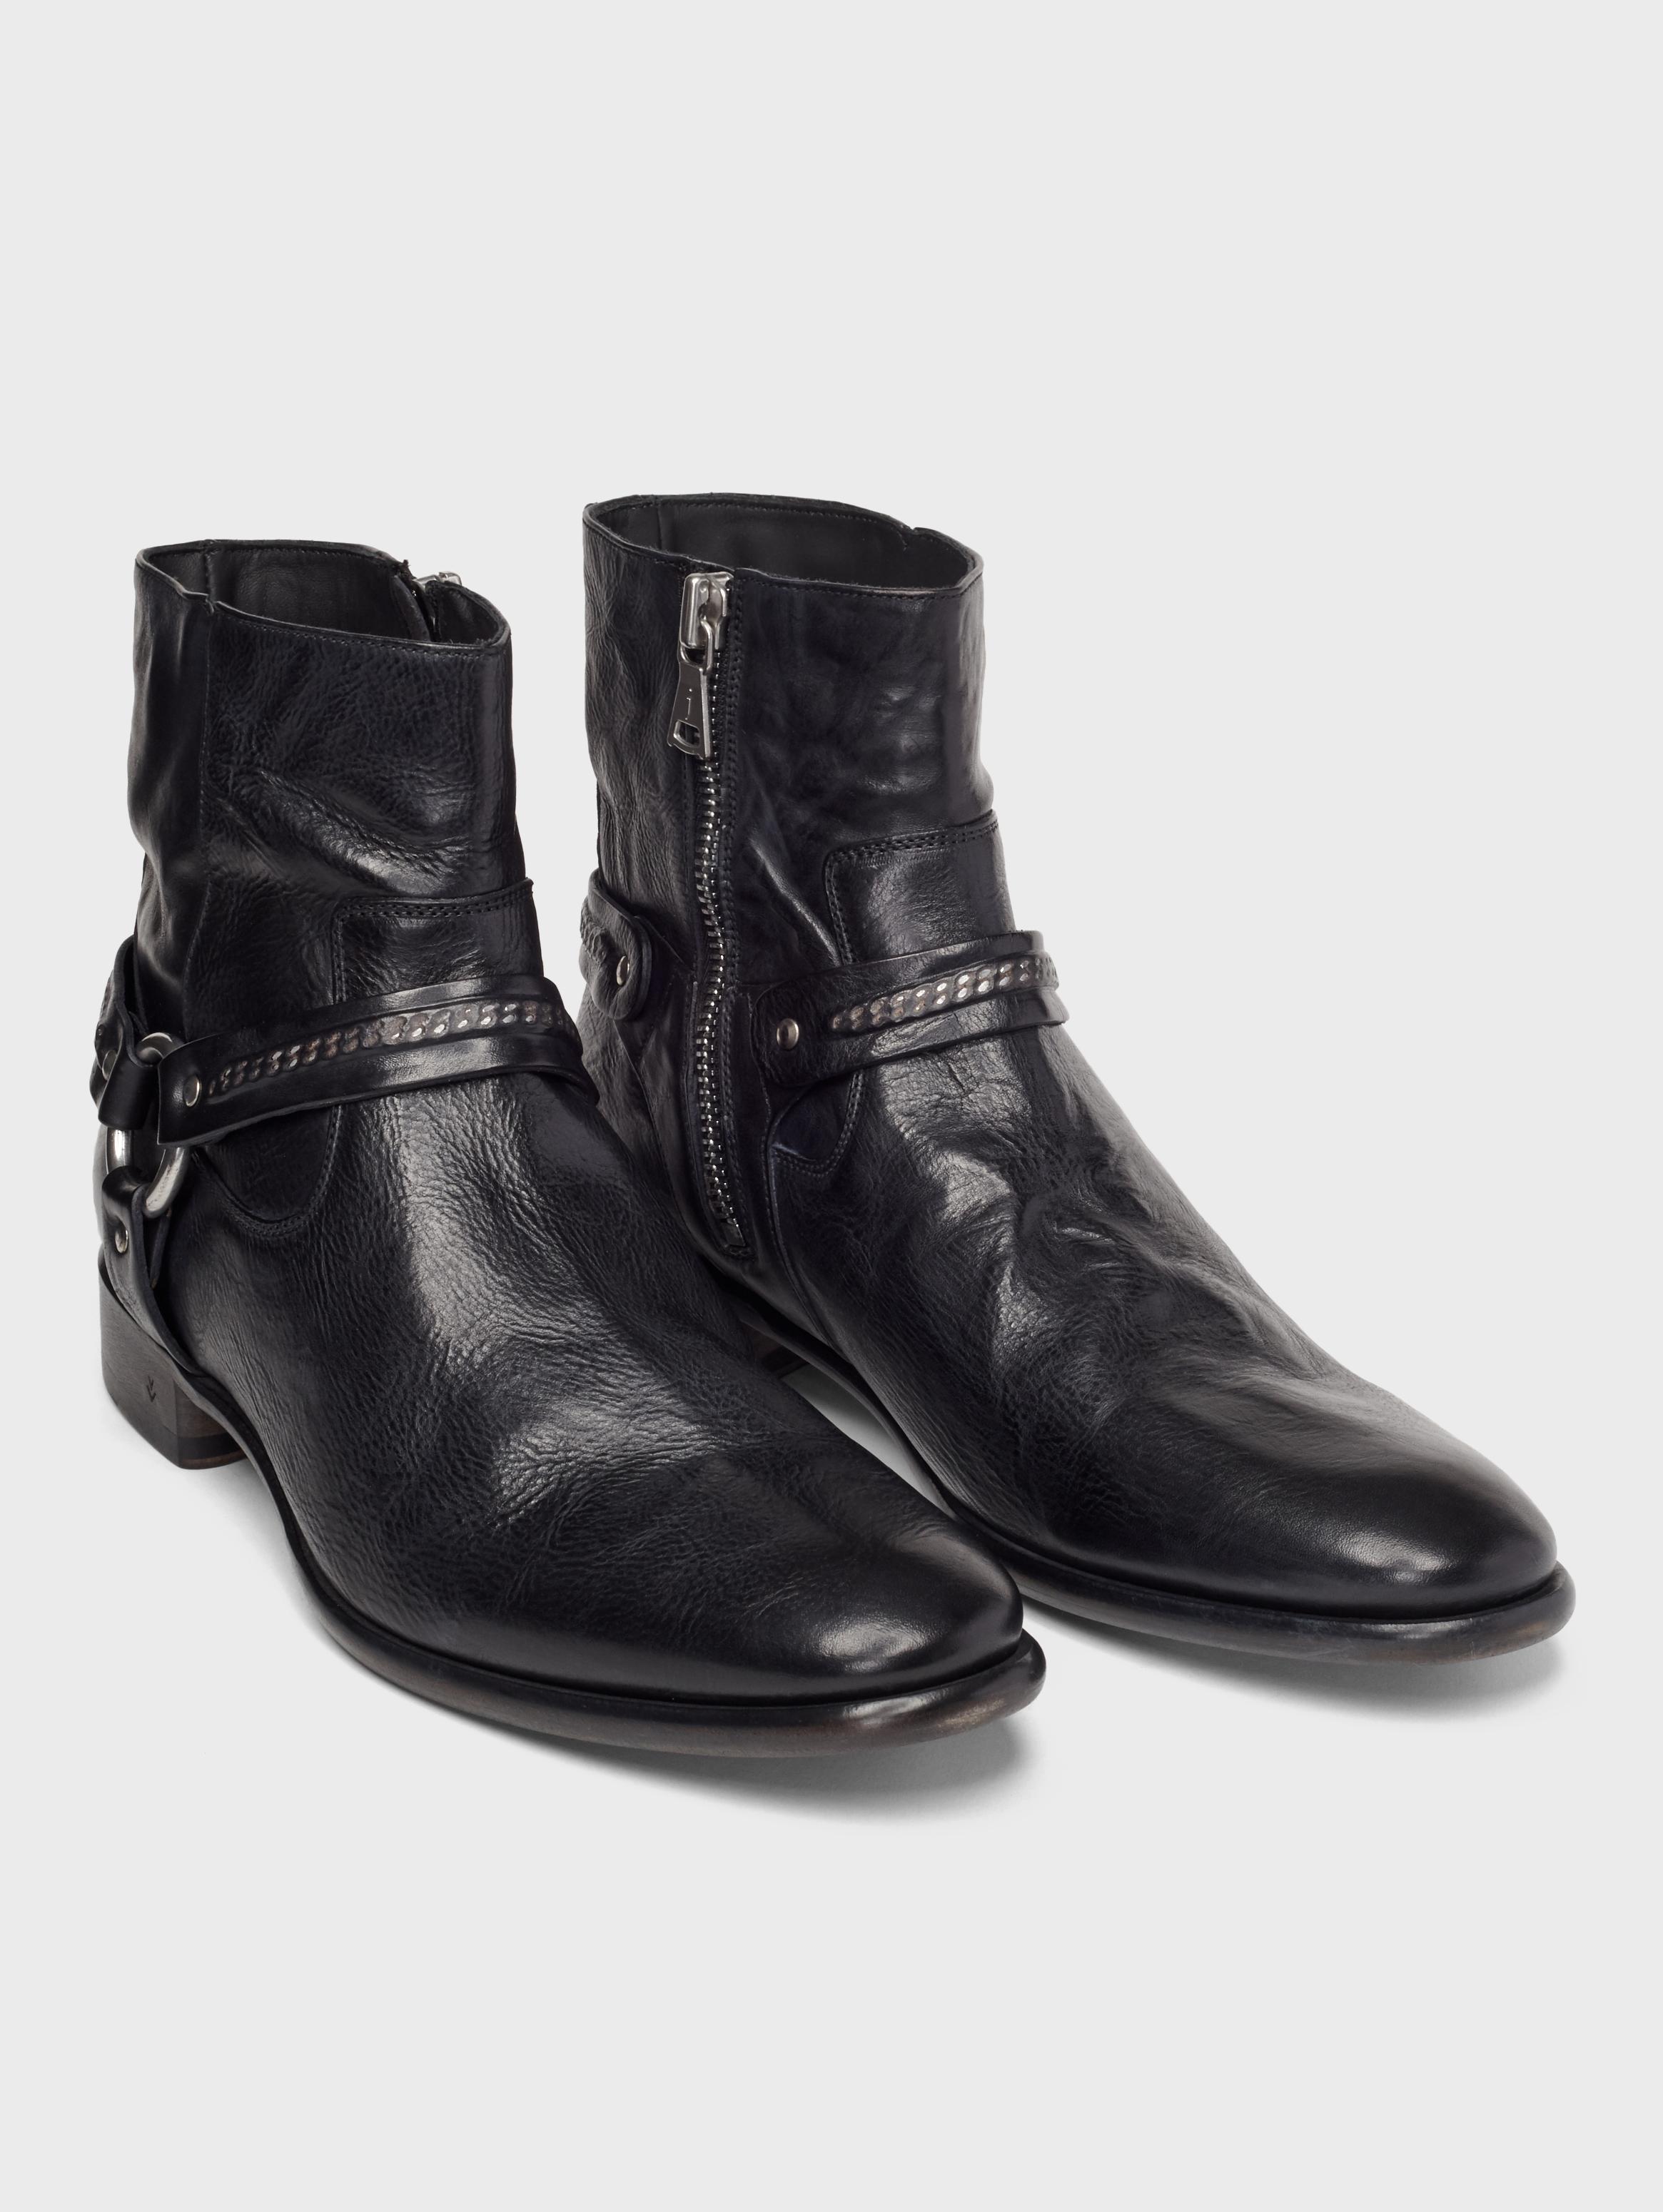 John Varvatos Eldridge Harness Boots Black